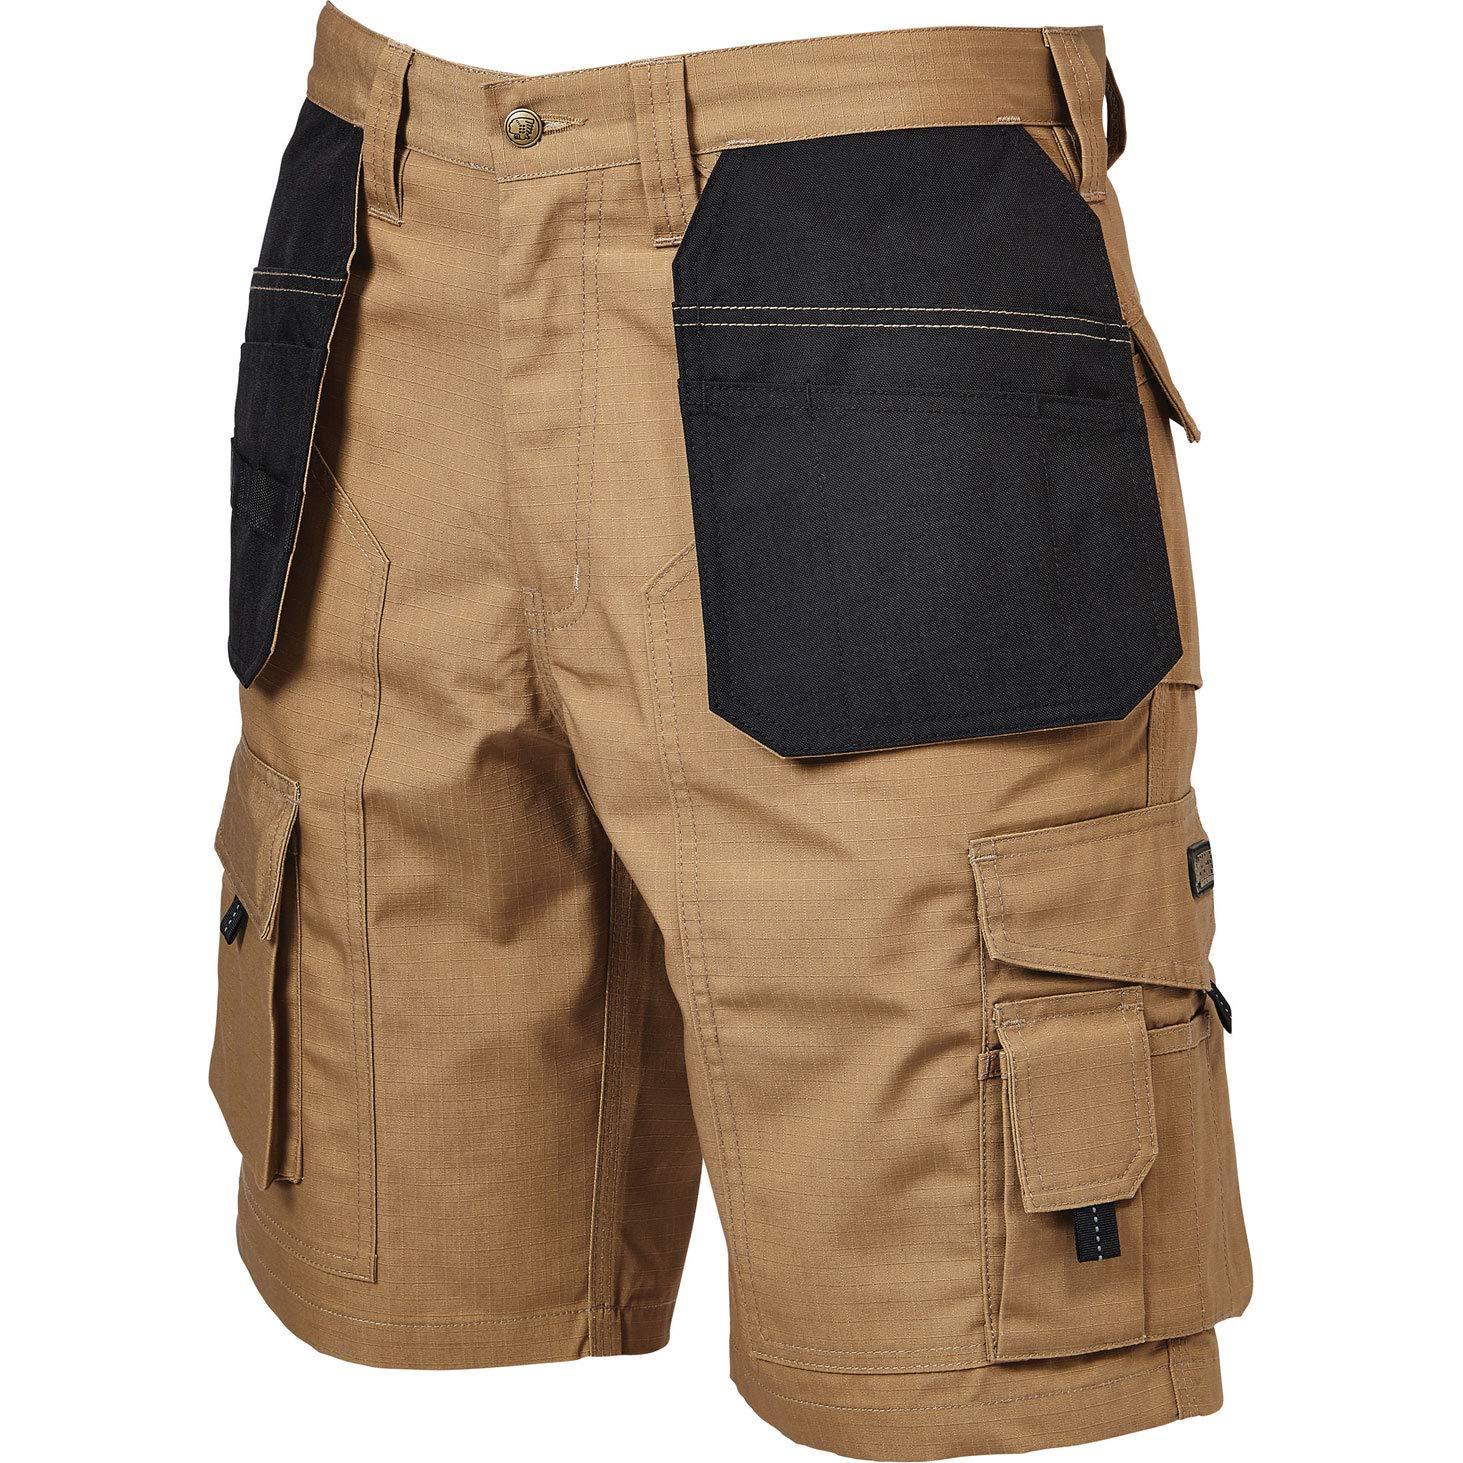 Apache APKHT SHORT STONE 38 Shorts, 38 Waist, Stone